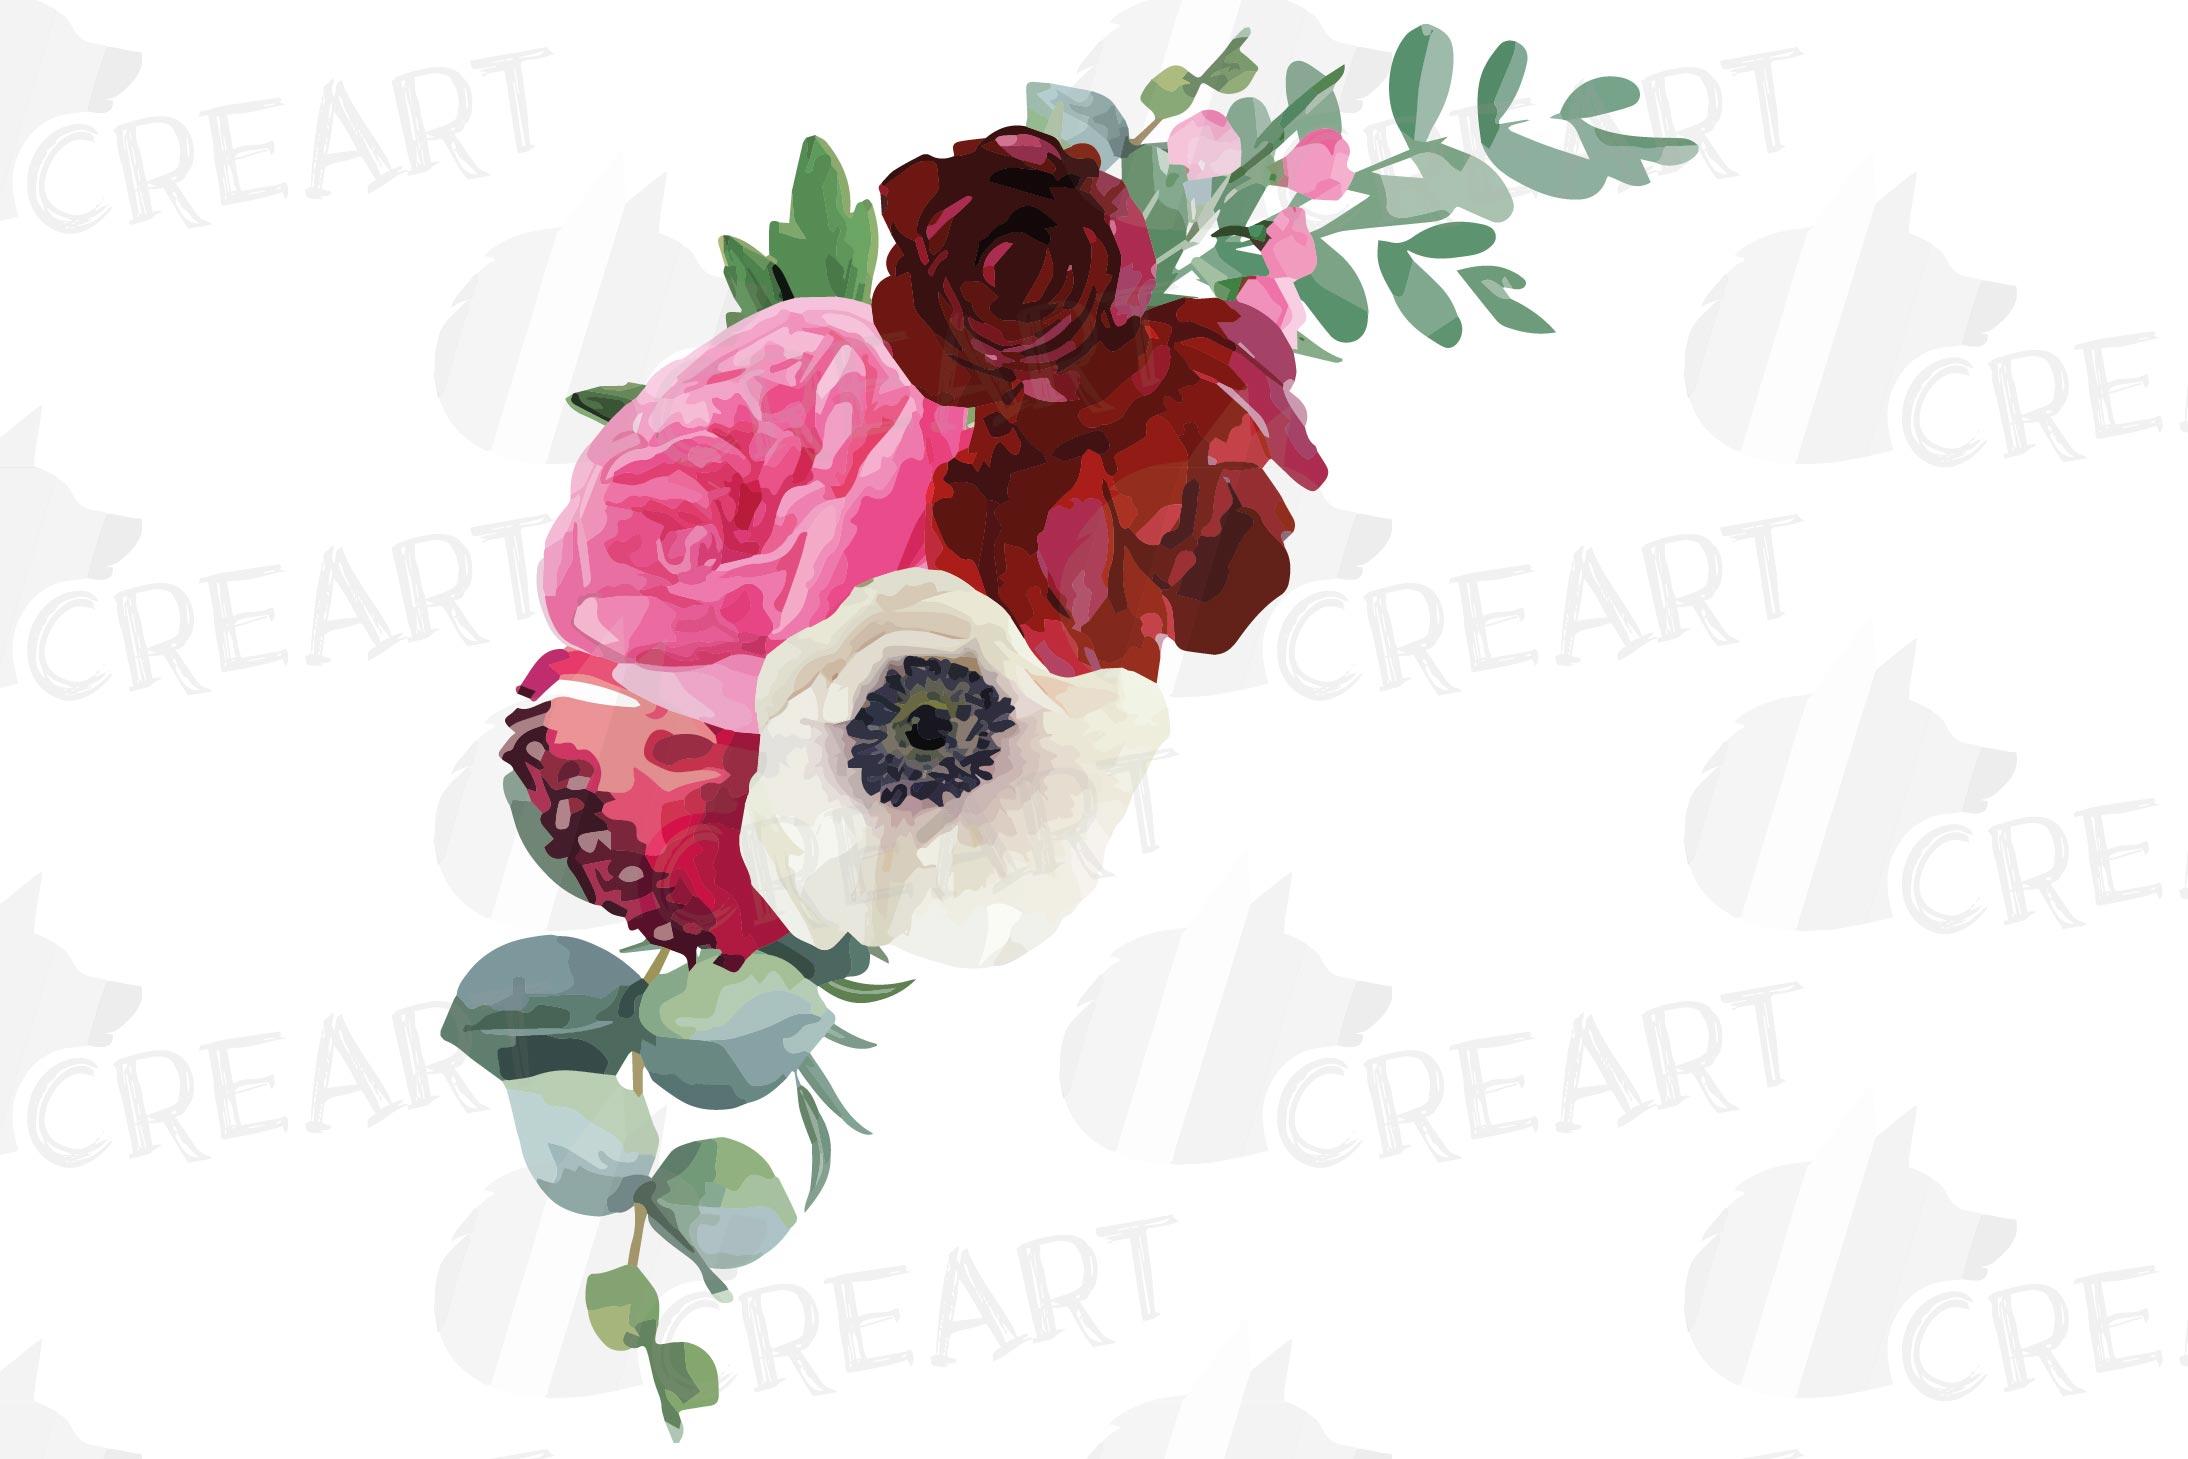 Watercolor elegant floral bouquets, rose, anemone decoration example image 4